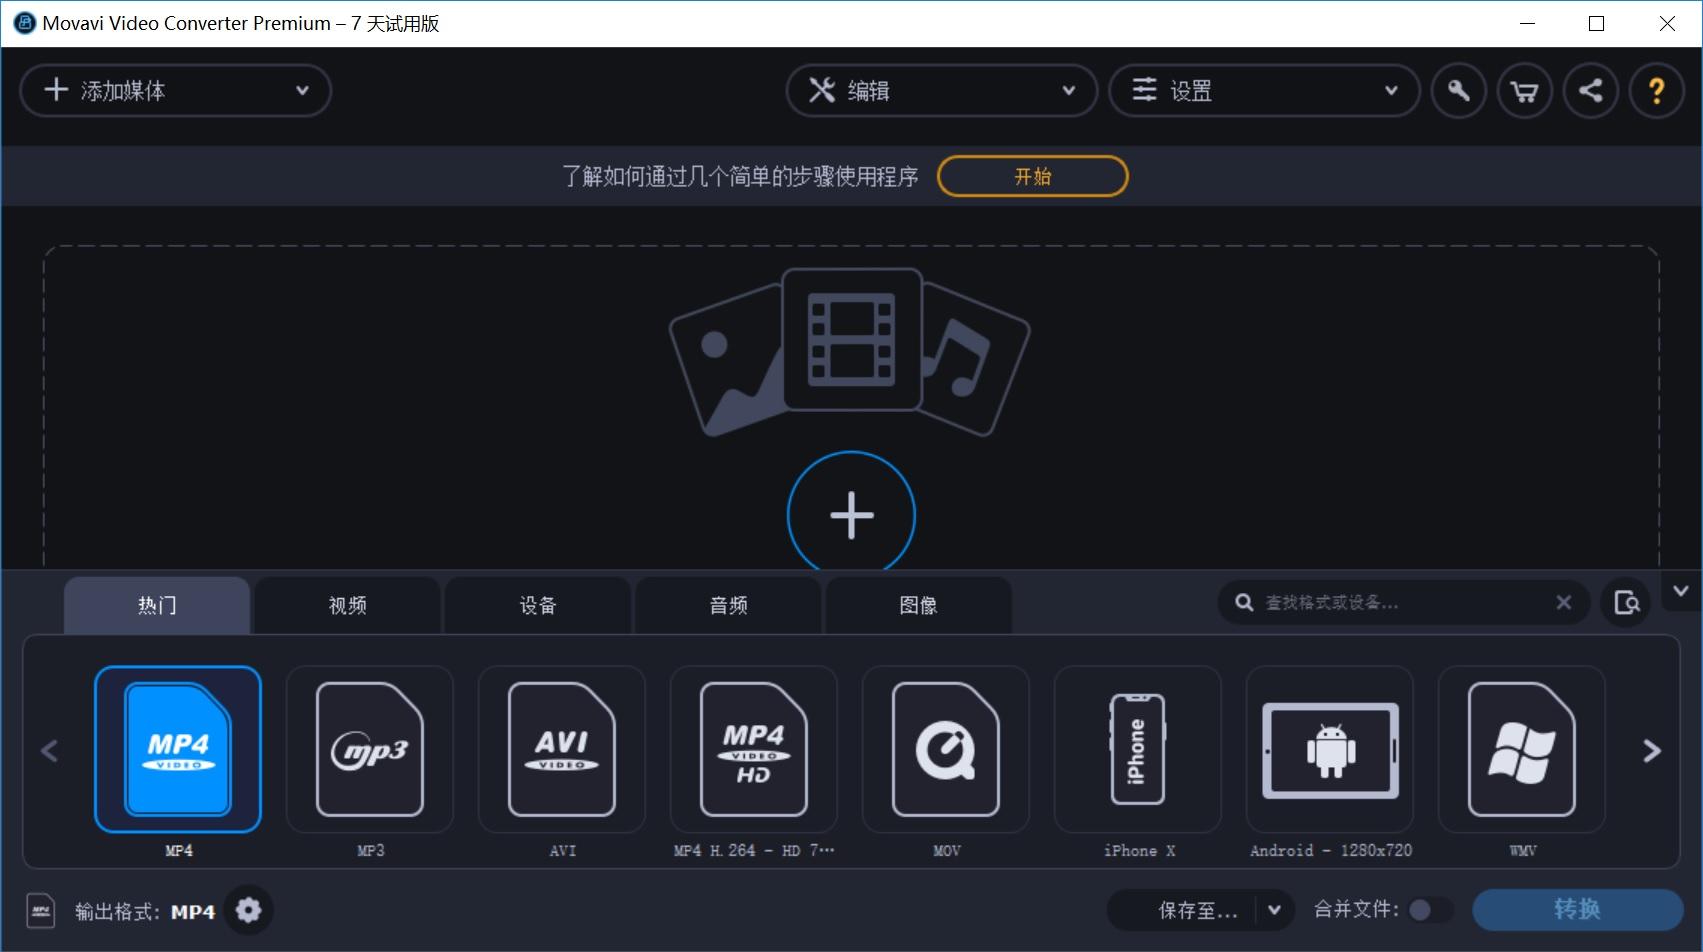 Movavi Video Converter 2020.jpg